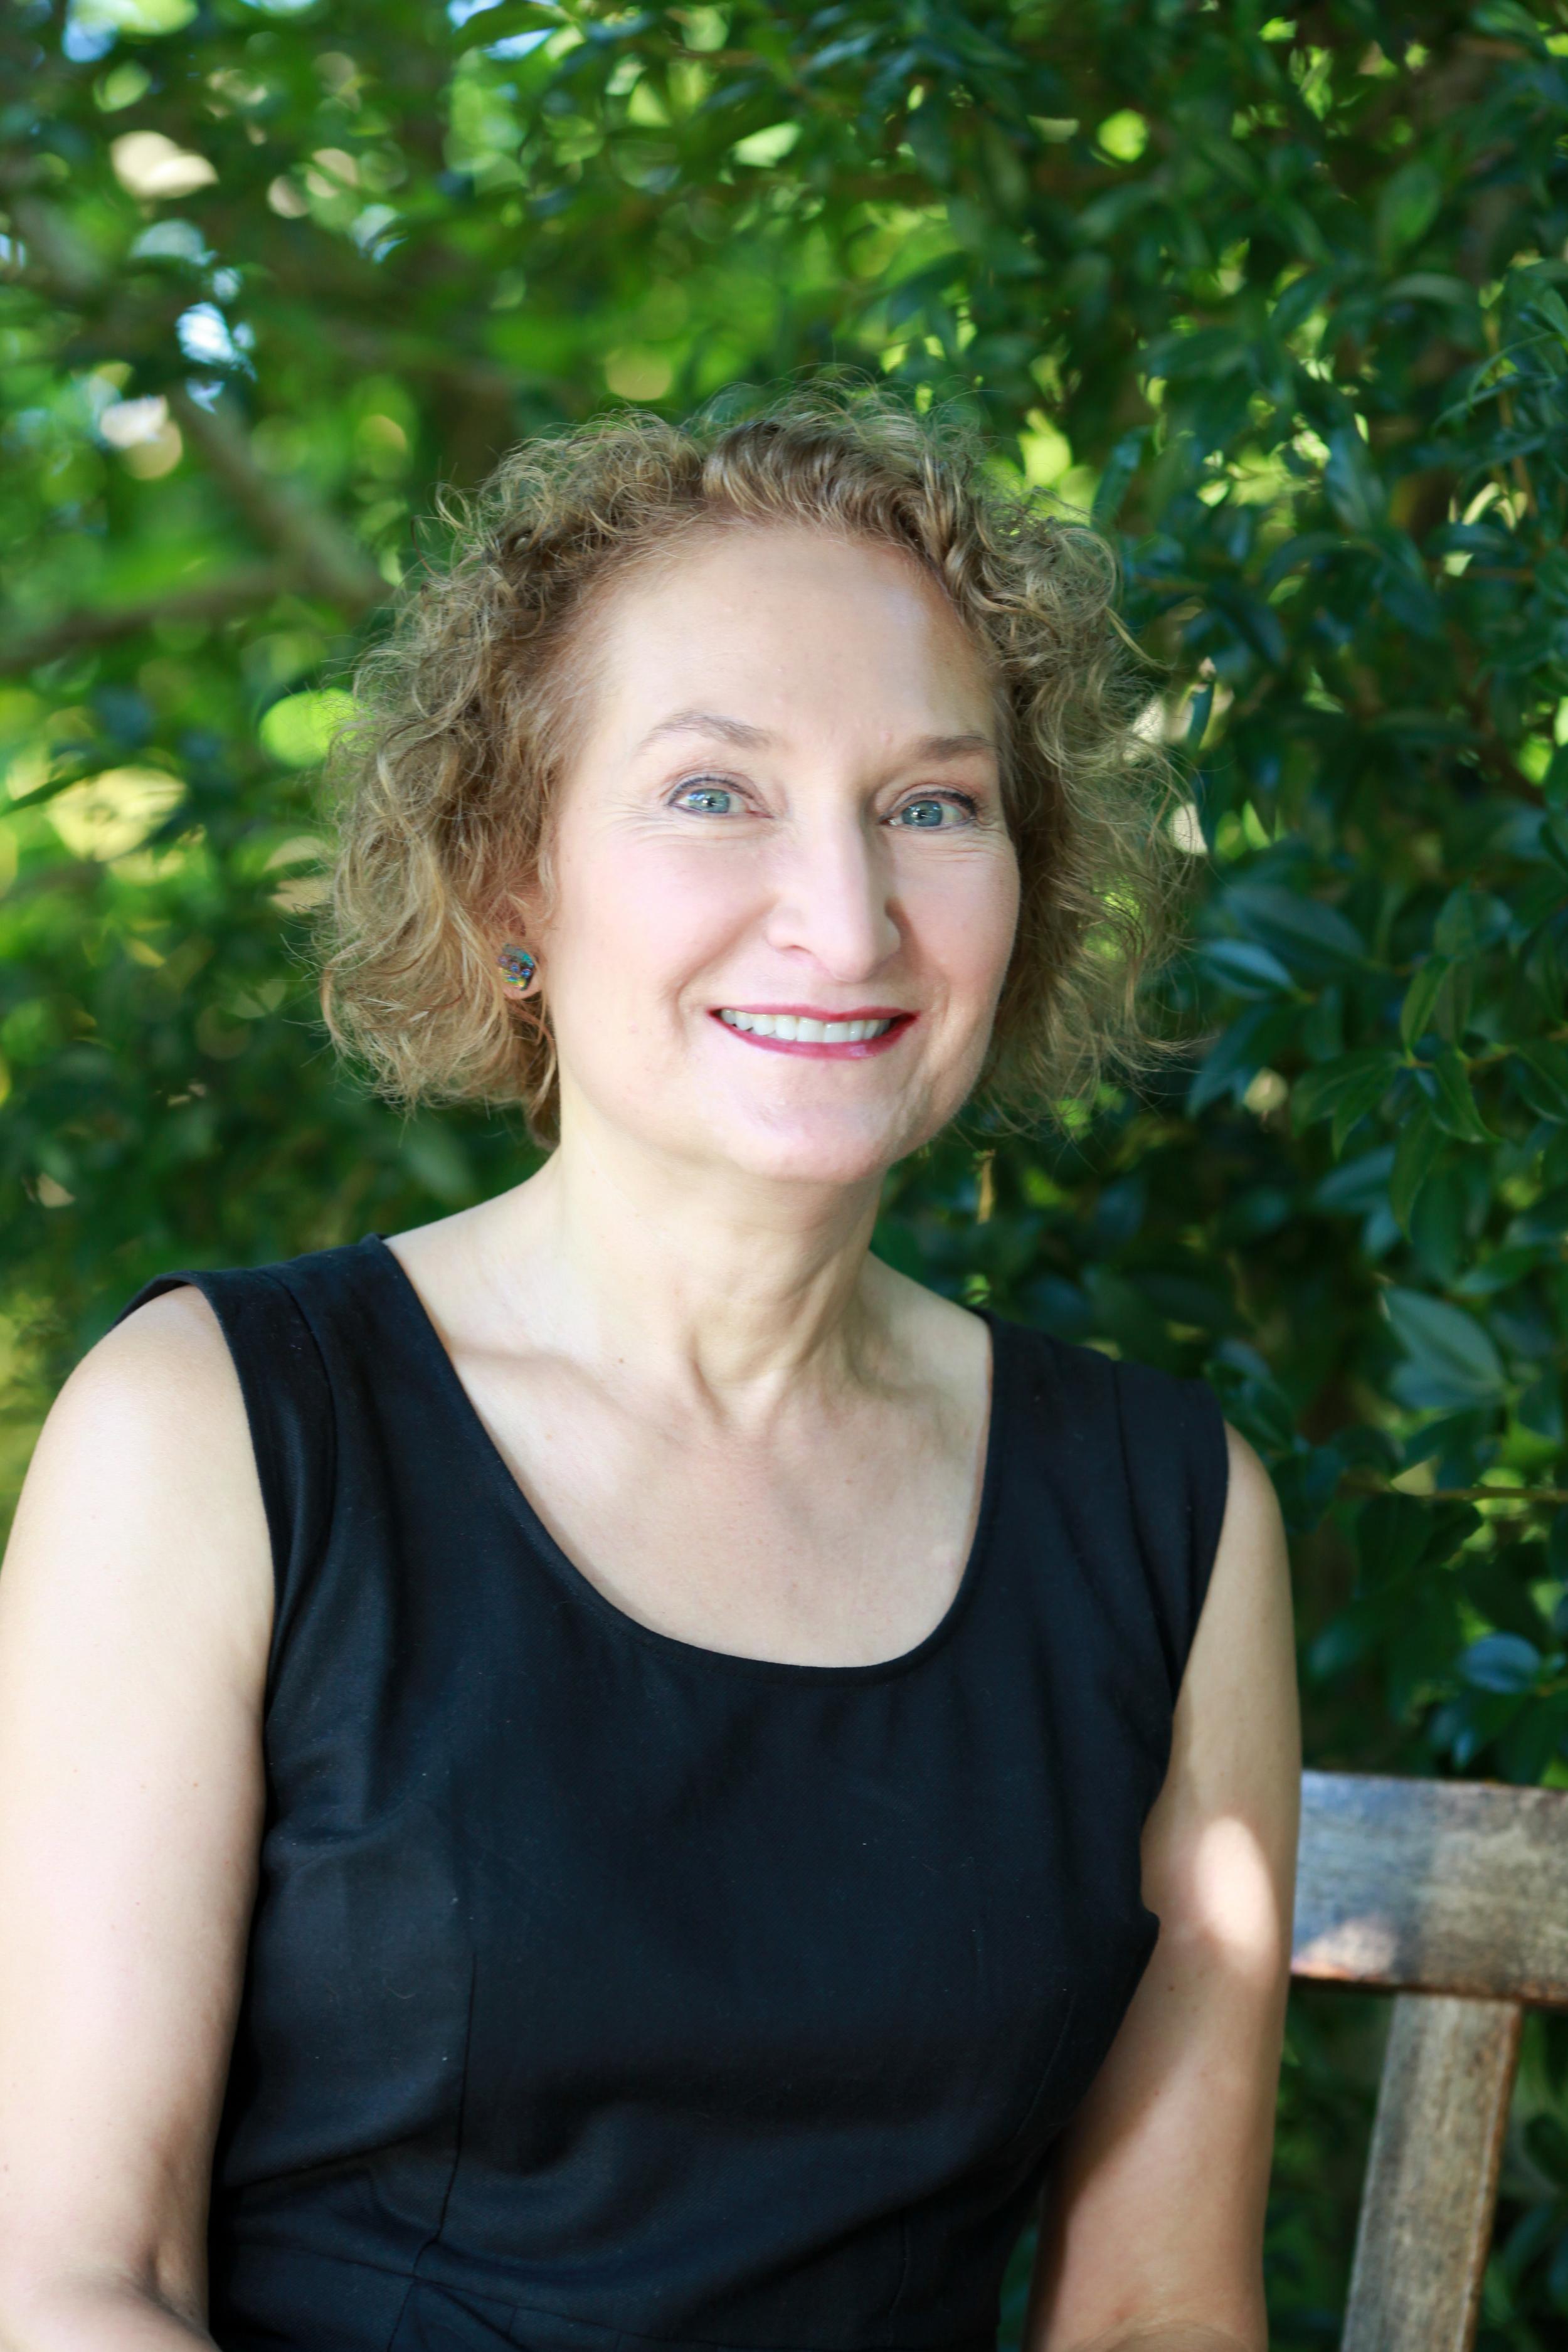 Author photo of Sherry Rind